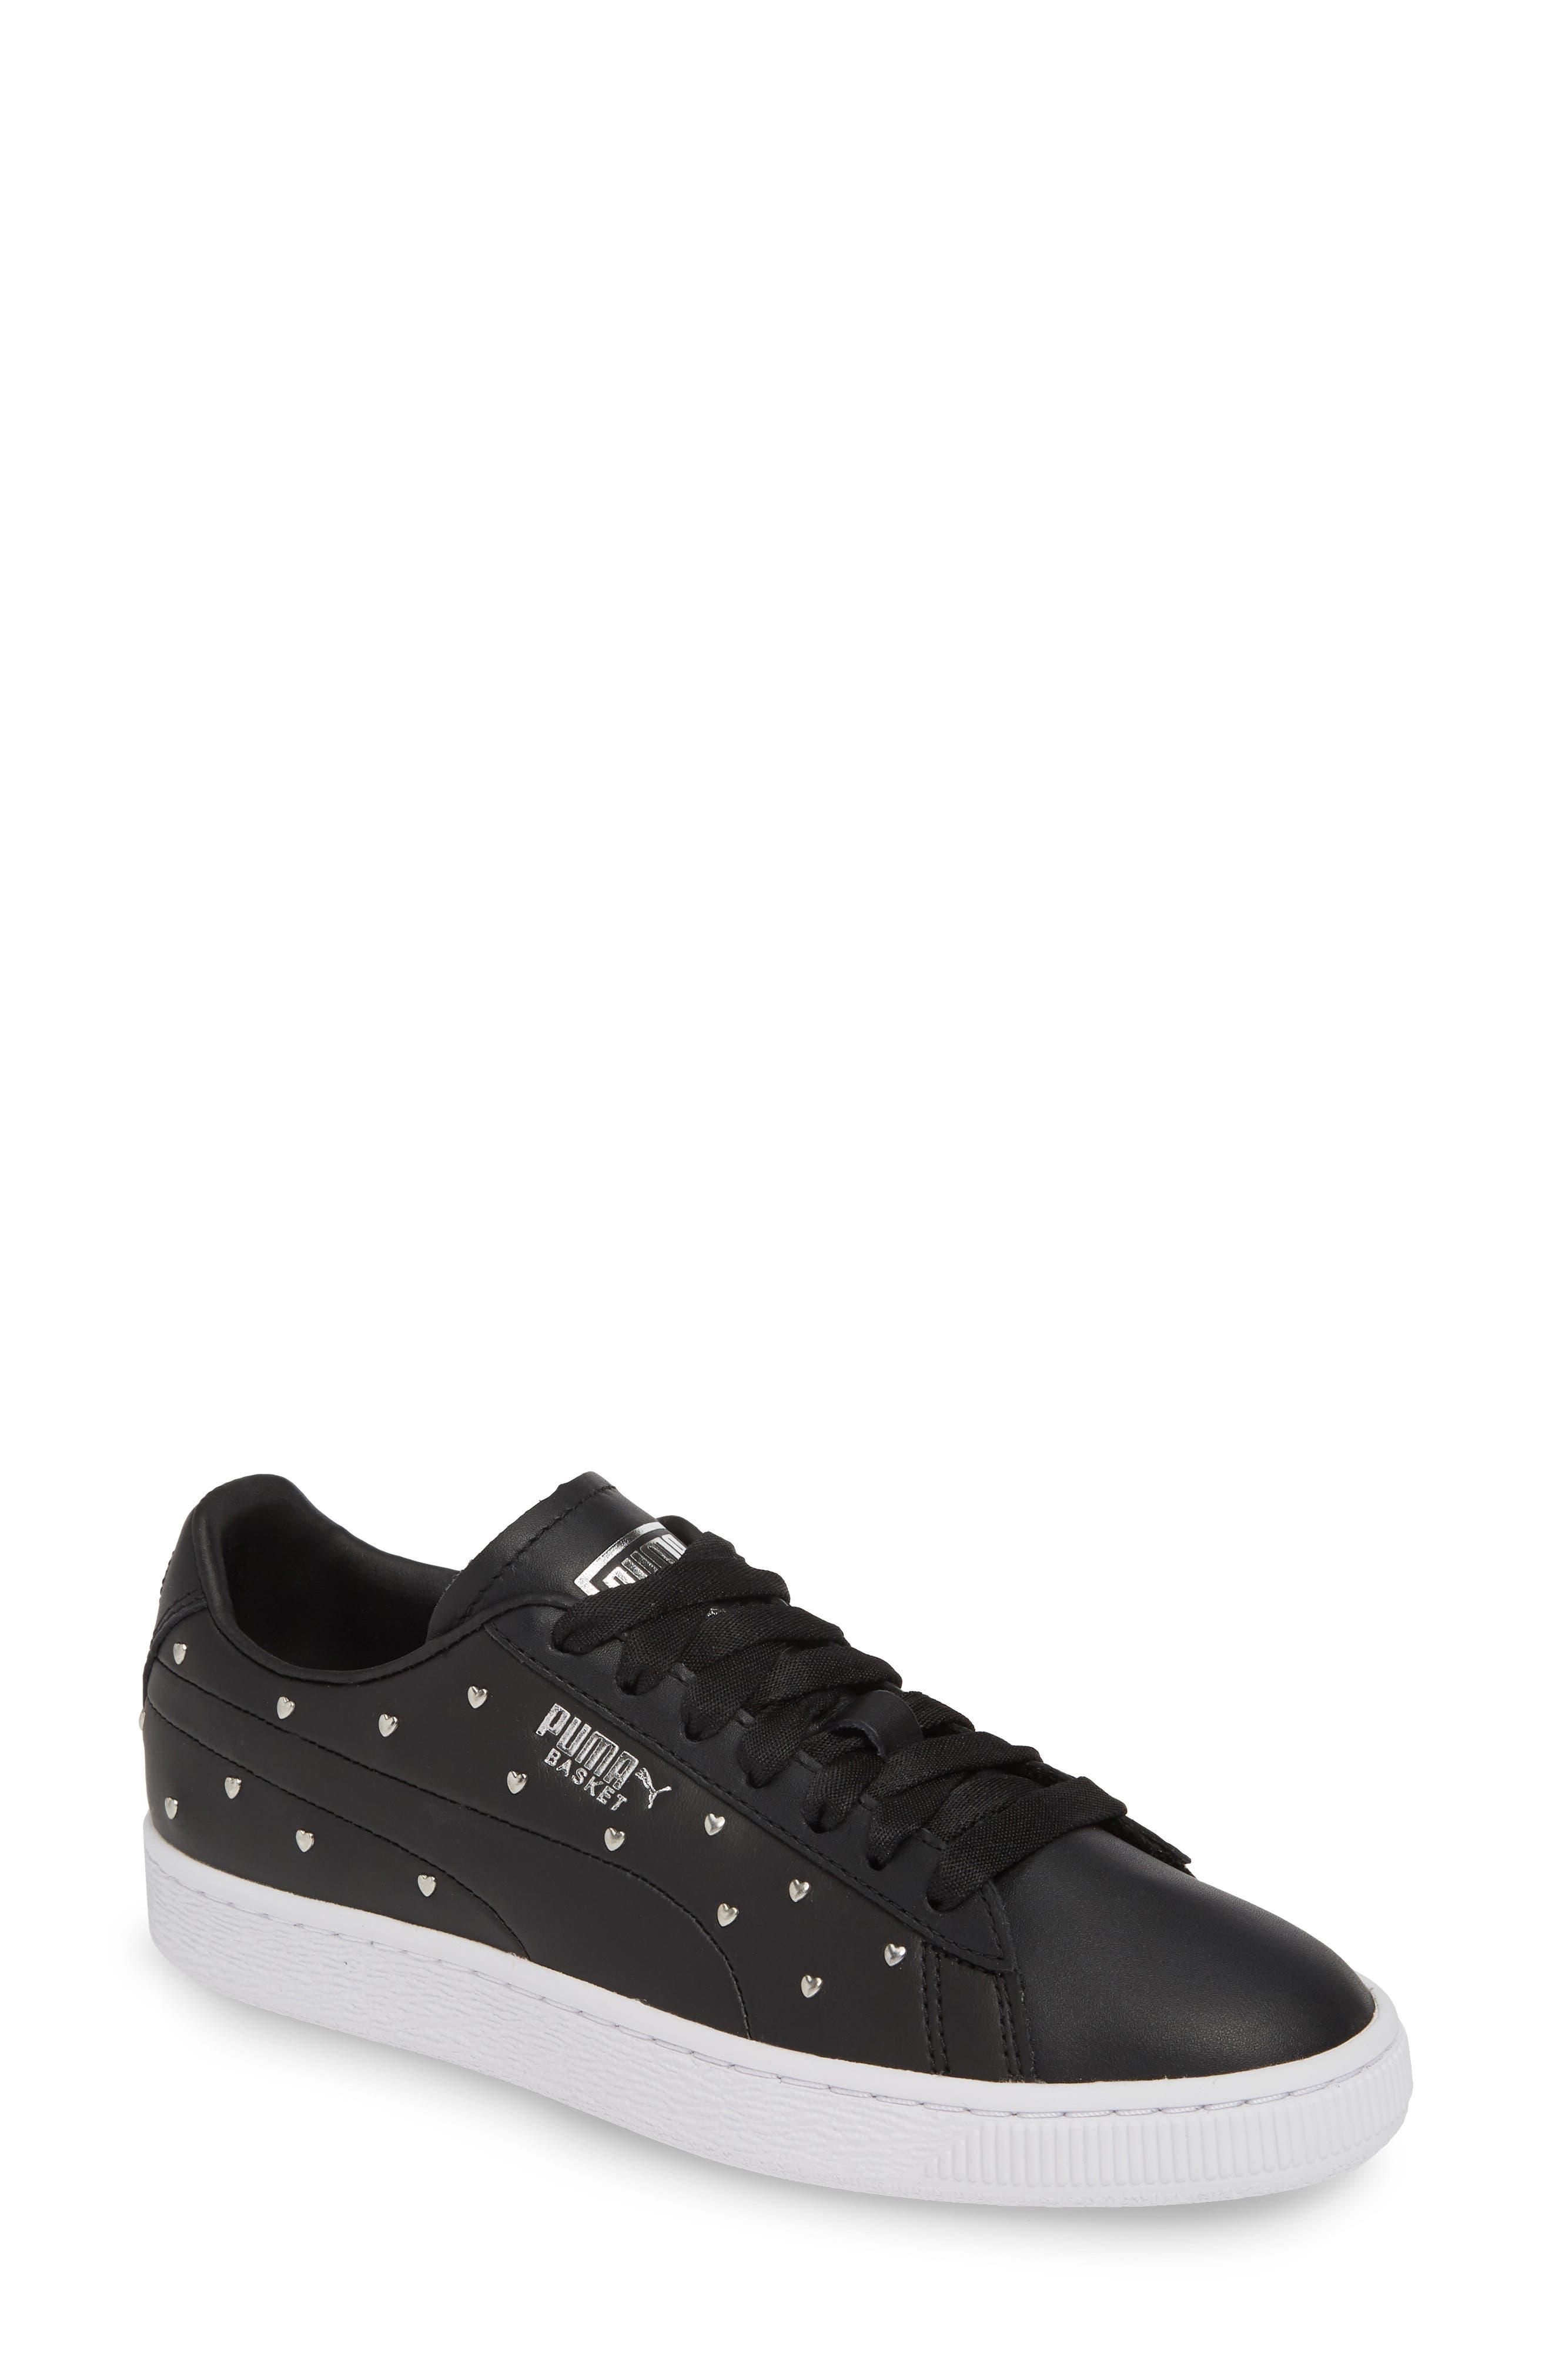 PUMA Basket Studs Sneaker, Main, color, BLACK/ SILVER